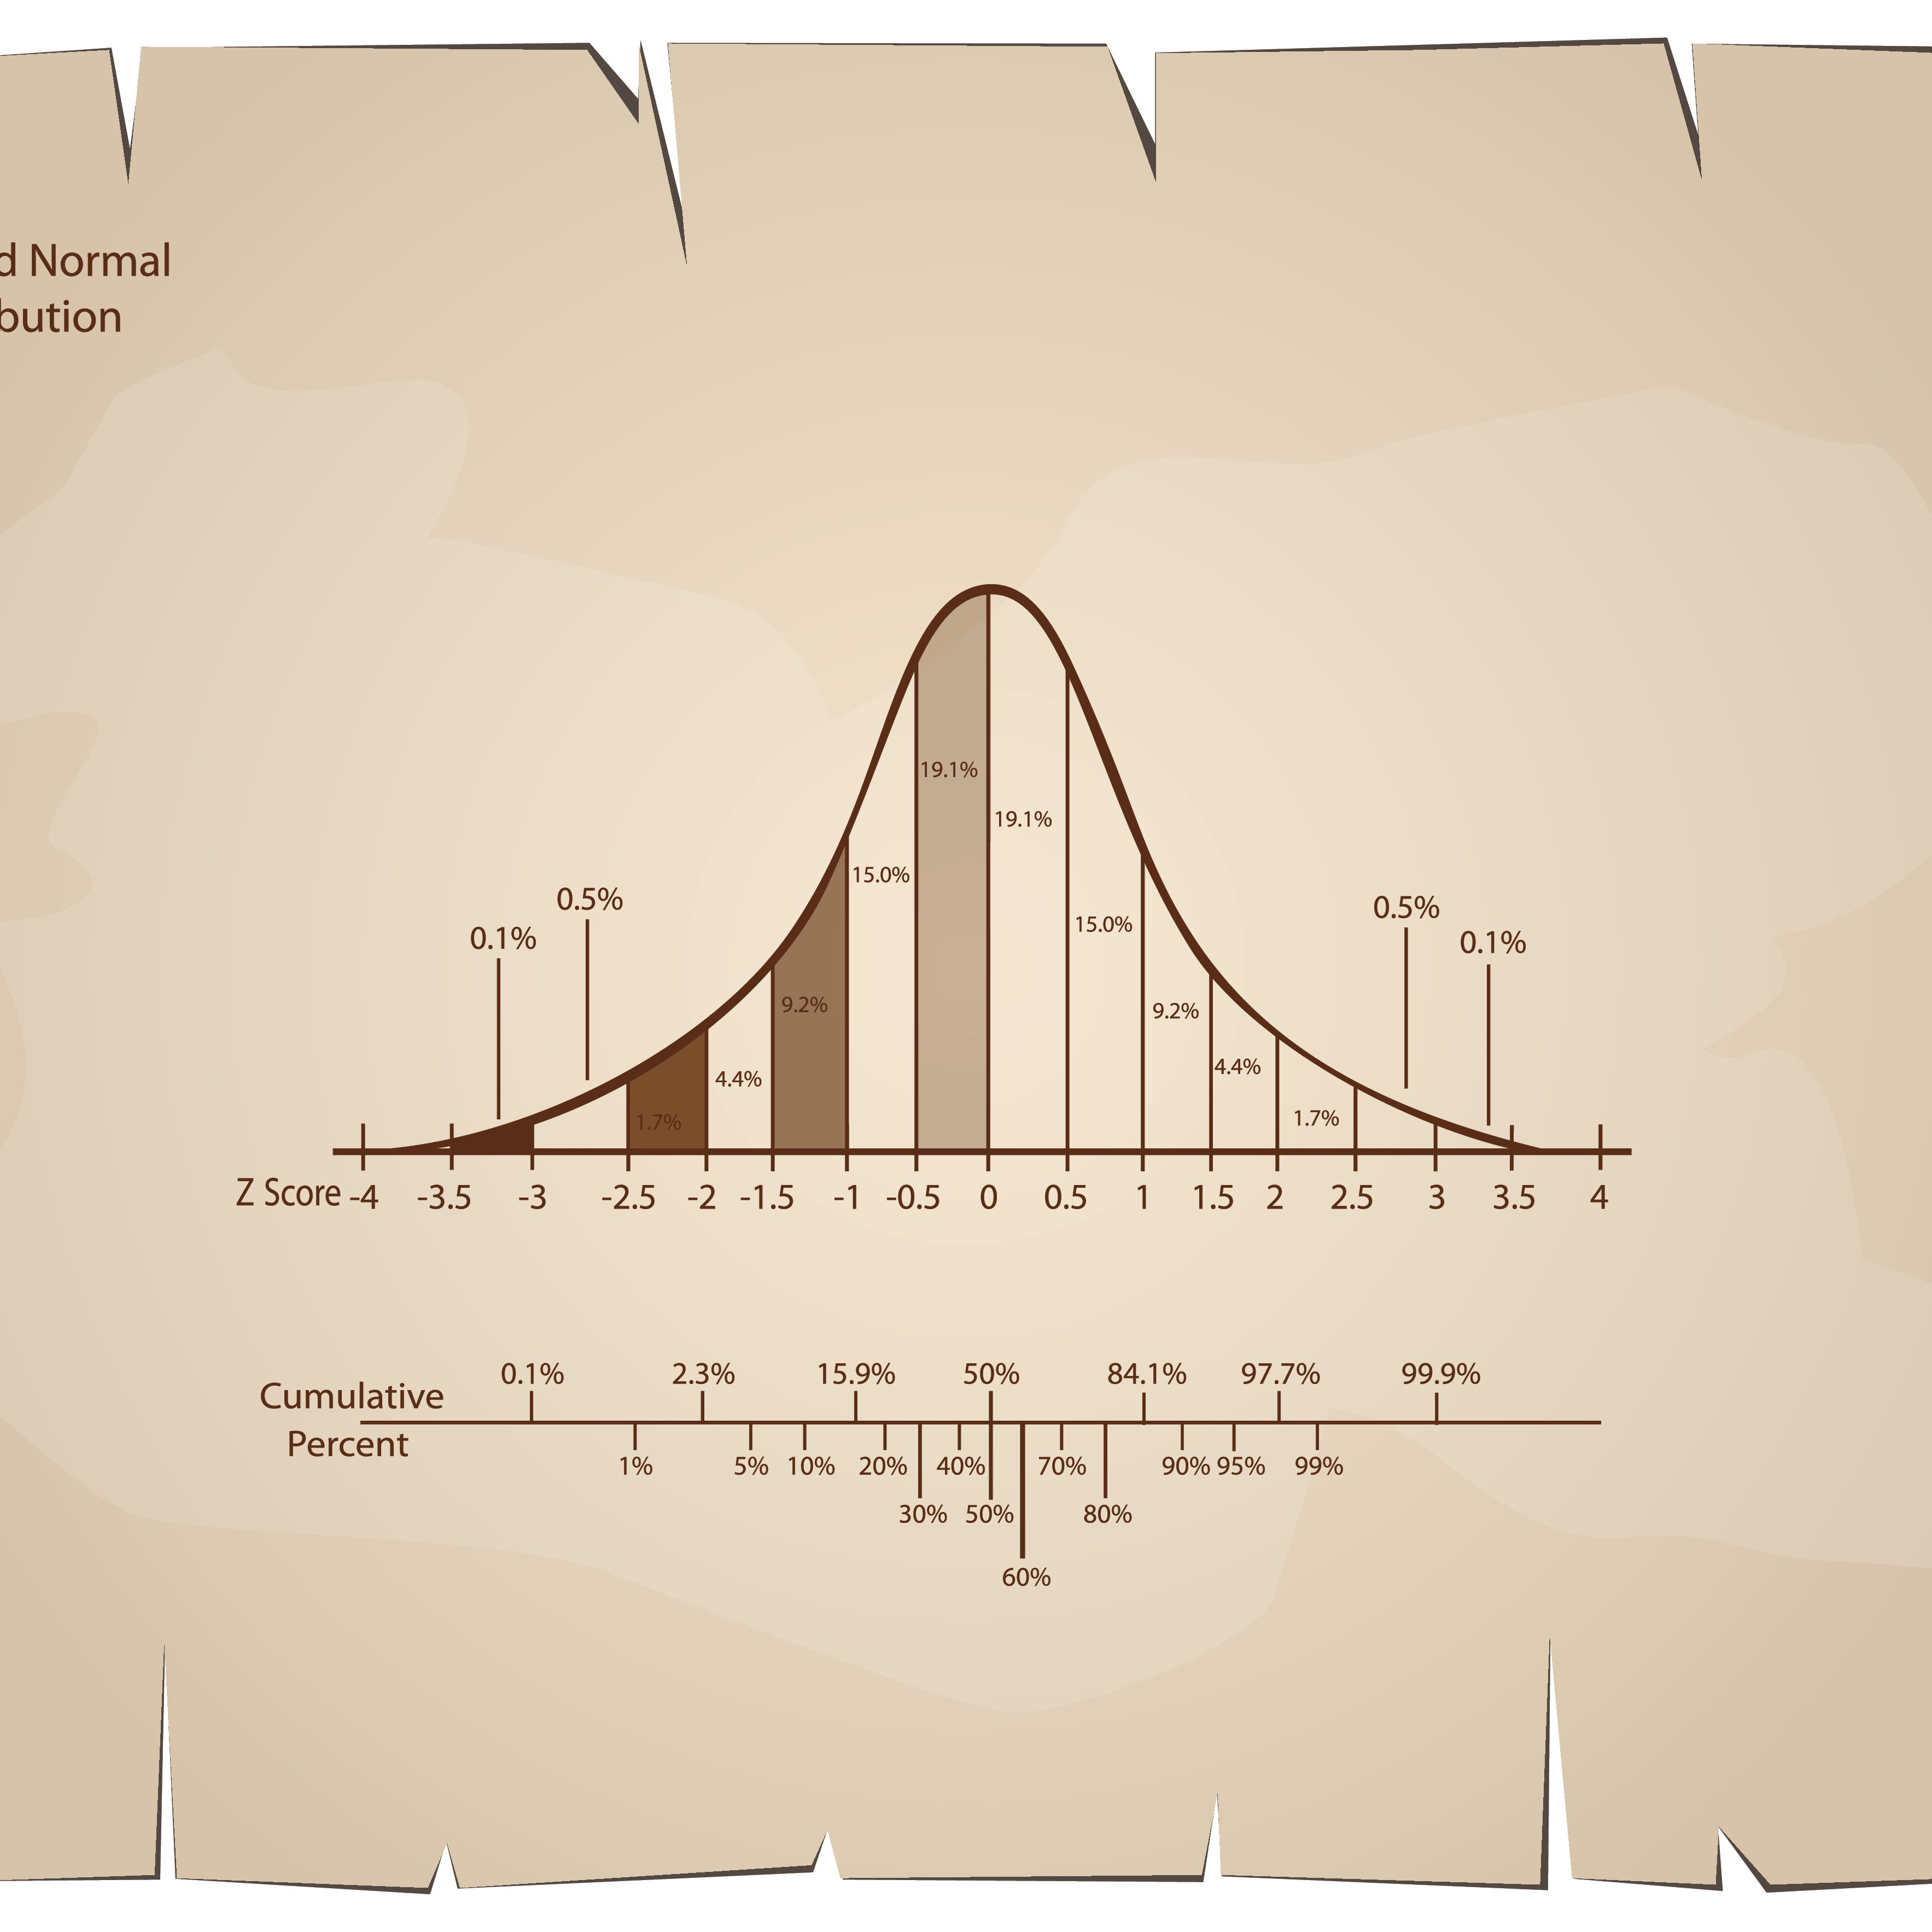 Statistics Worksheet: Calculating Z-Scores